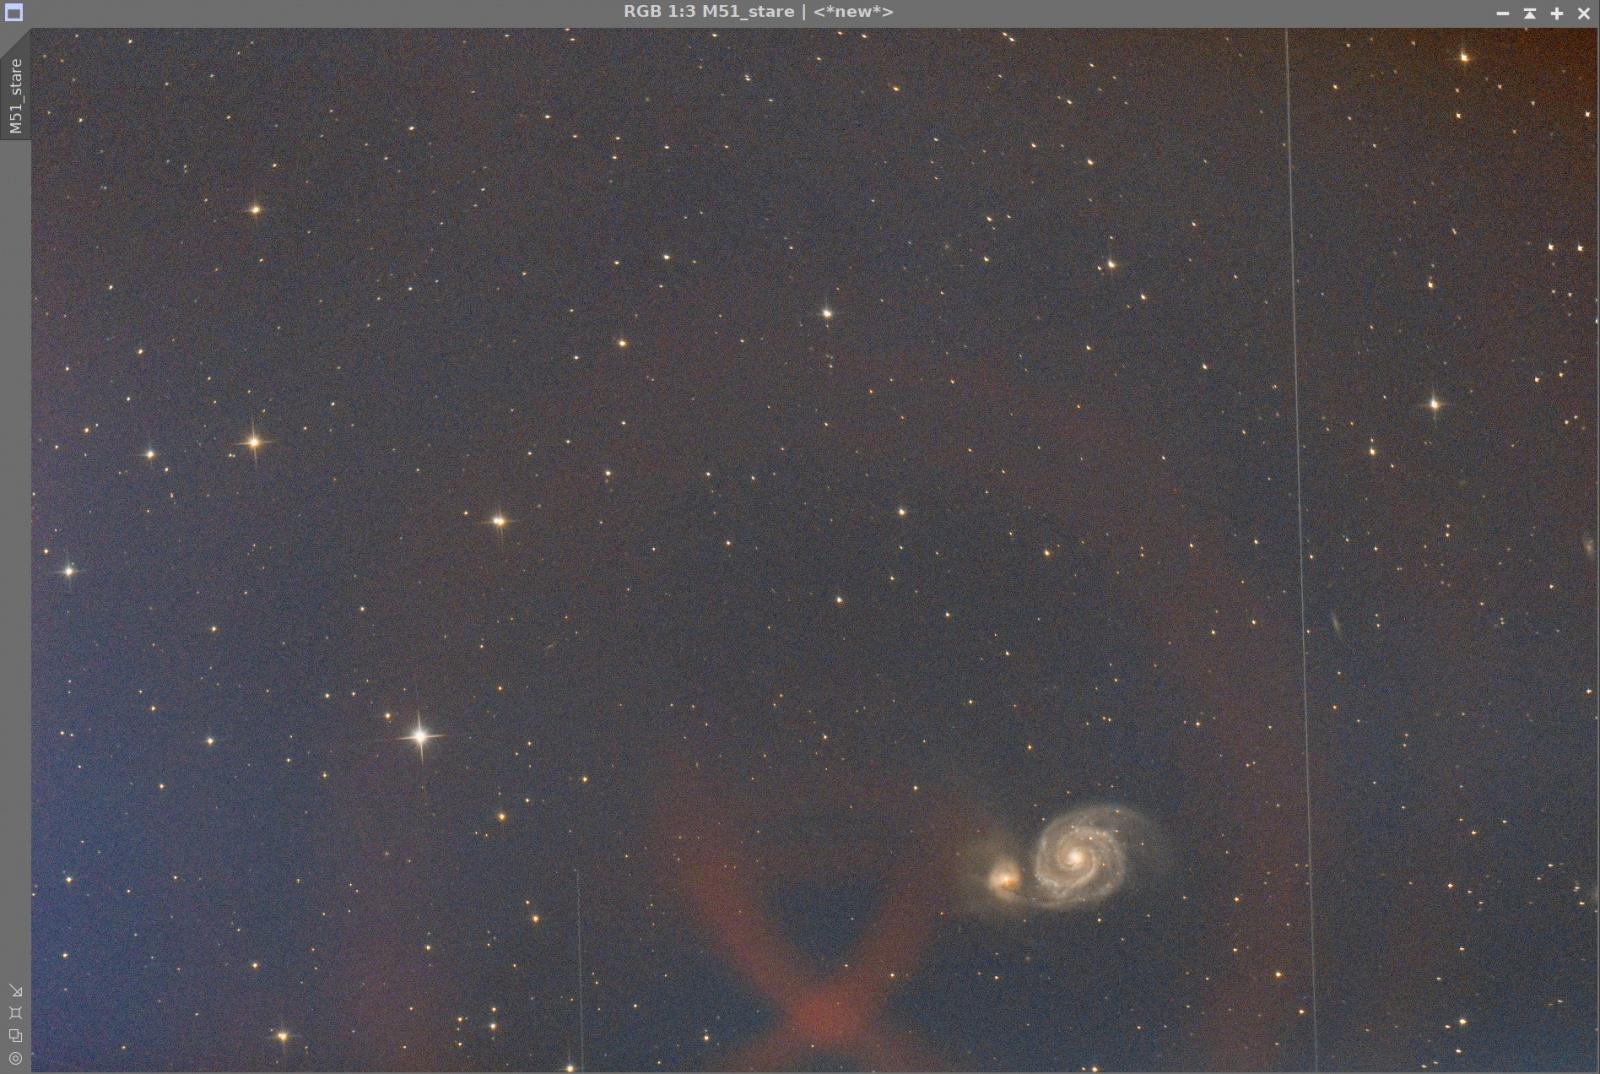 M51_Stare_PIX.thumb.jpg.efe6c8f969b85fb4c81e7703285edaf2.jpg